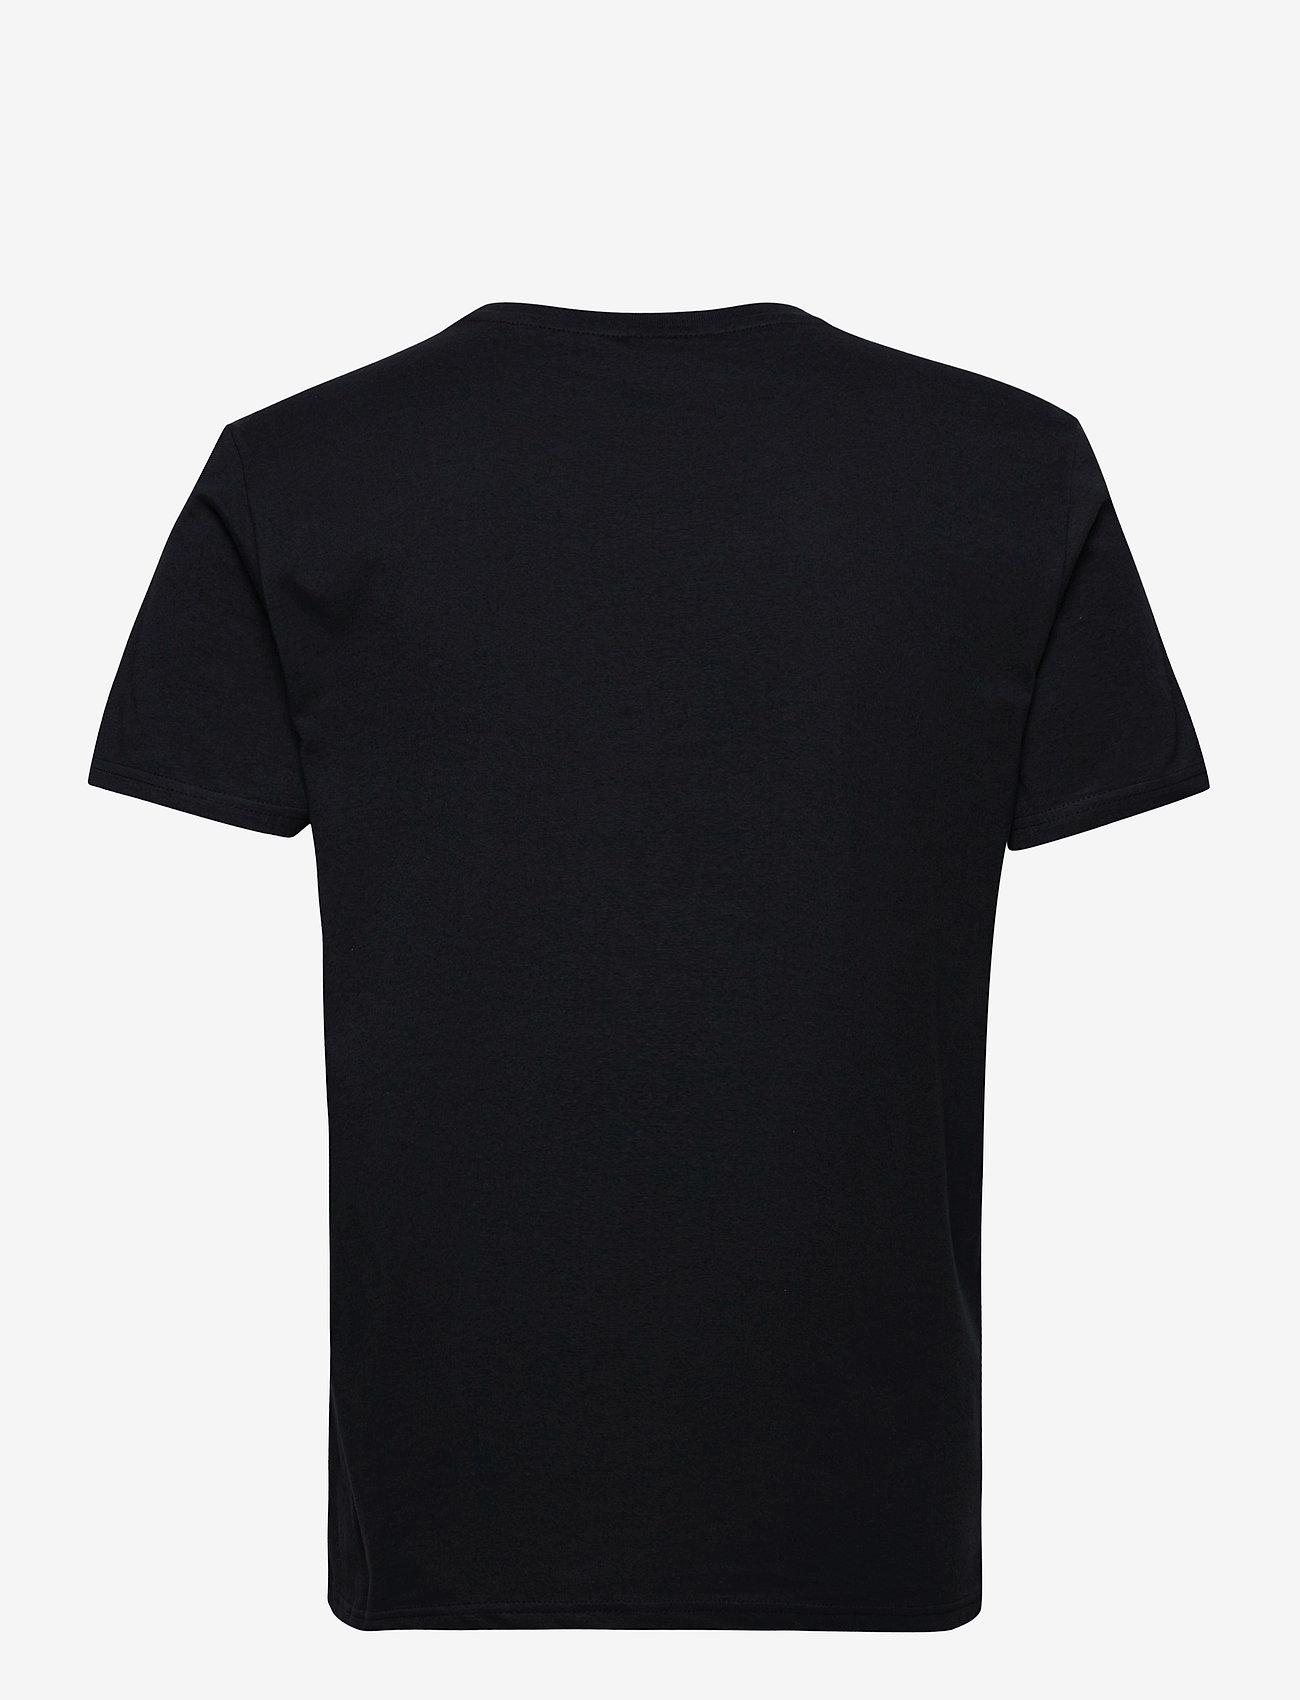 H2O - Skagen Tee - kortærmede t-shirts - navy/white/col. - 1